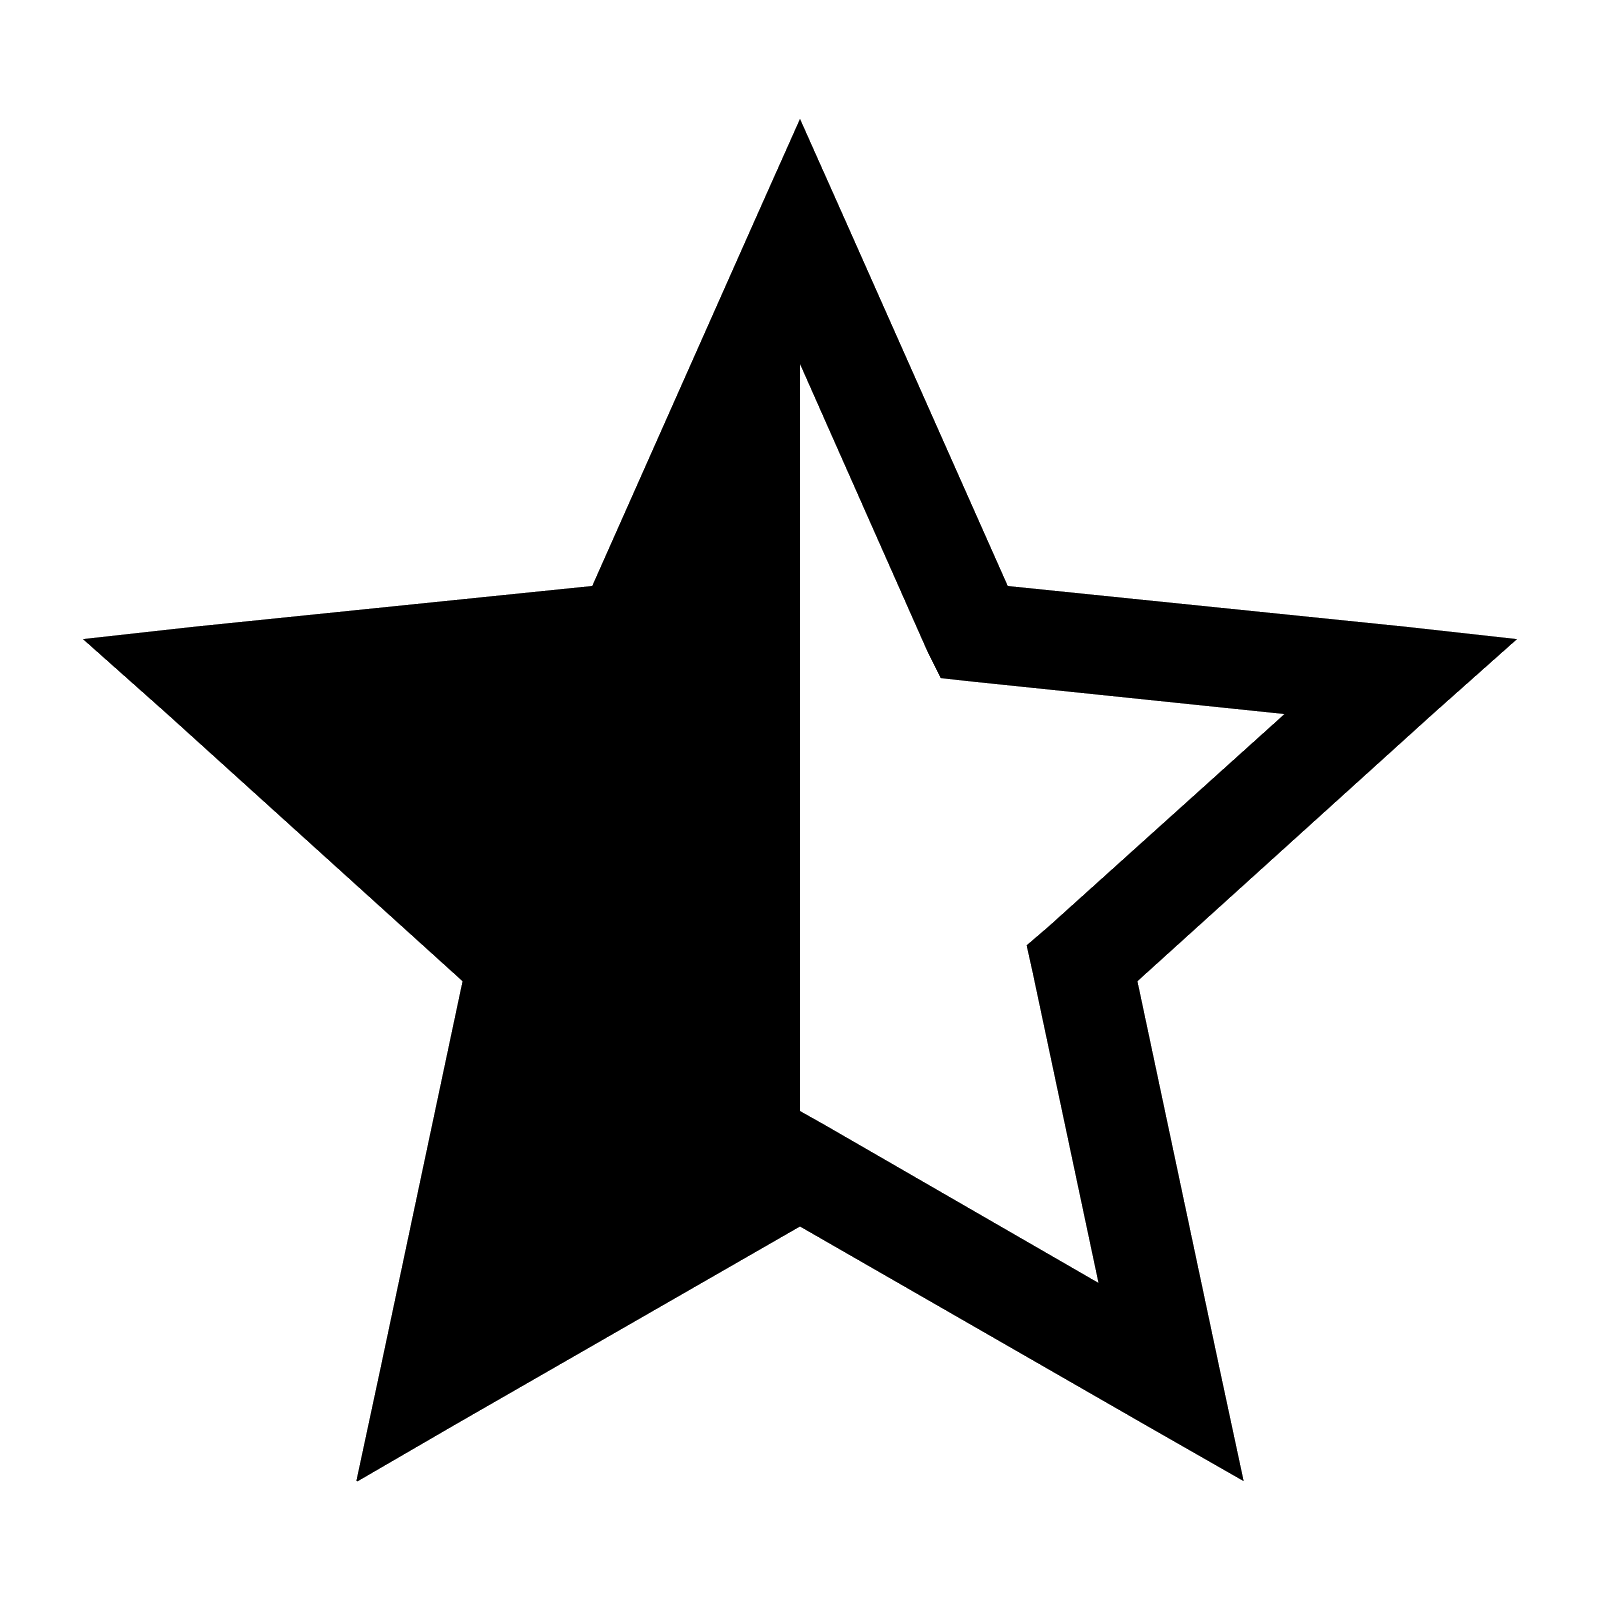 Half star clipart vector transparent stock Black Star PNG Image - PurePNG | Free transparent CC0 PNG Image Library vector transparent stock